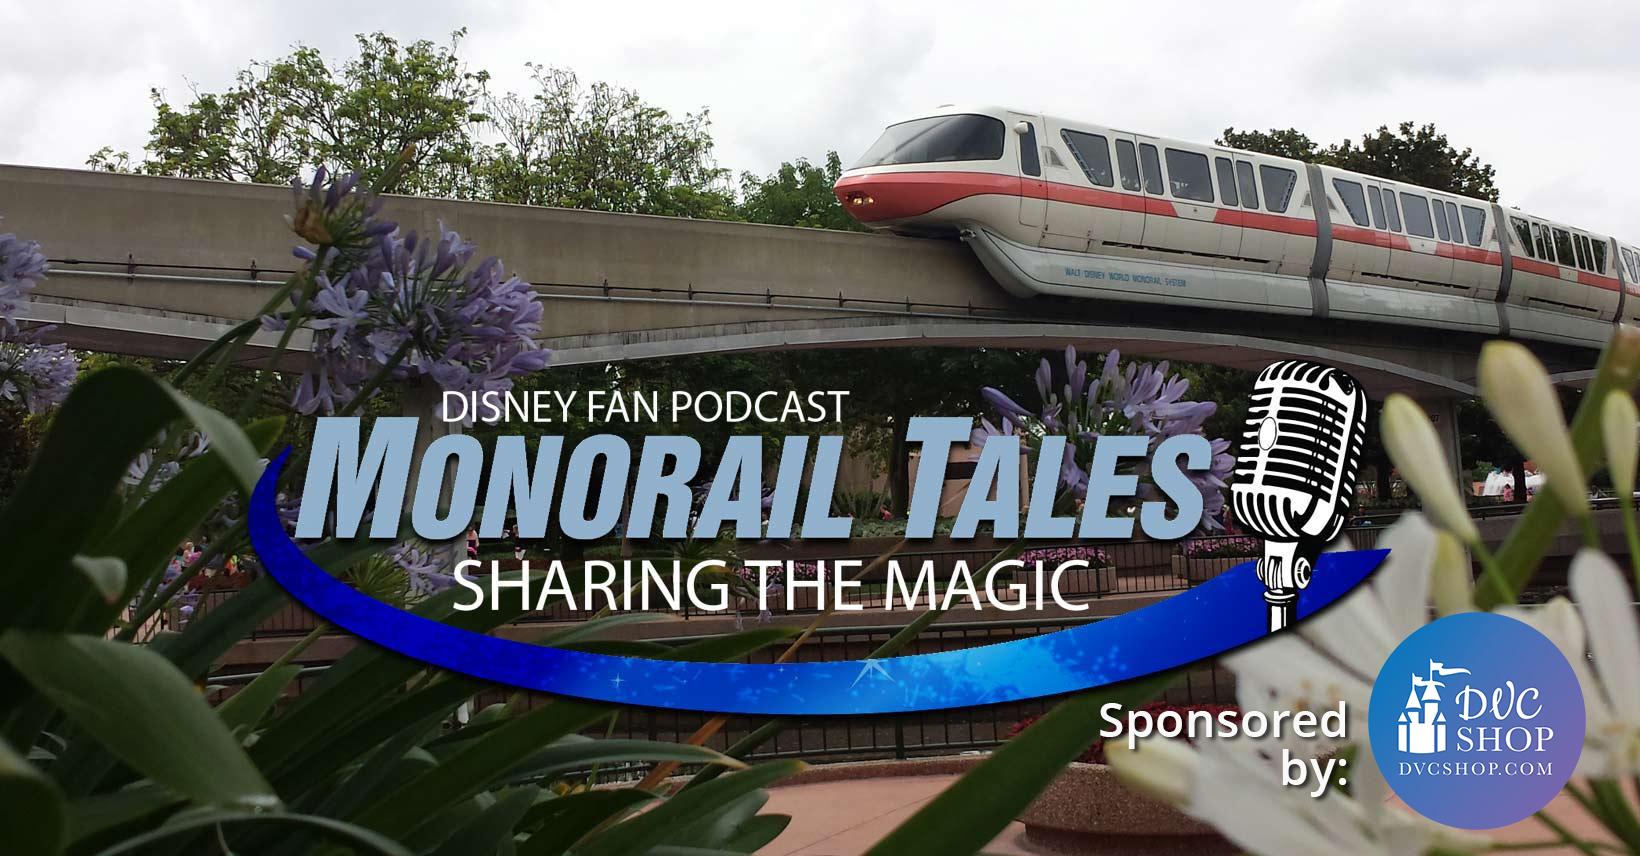 DVC Shop sponsors Monorail Tales Podcast